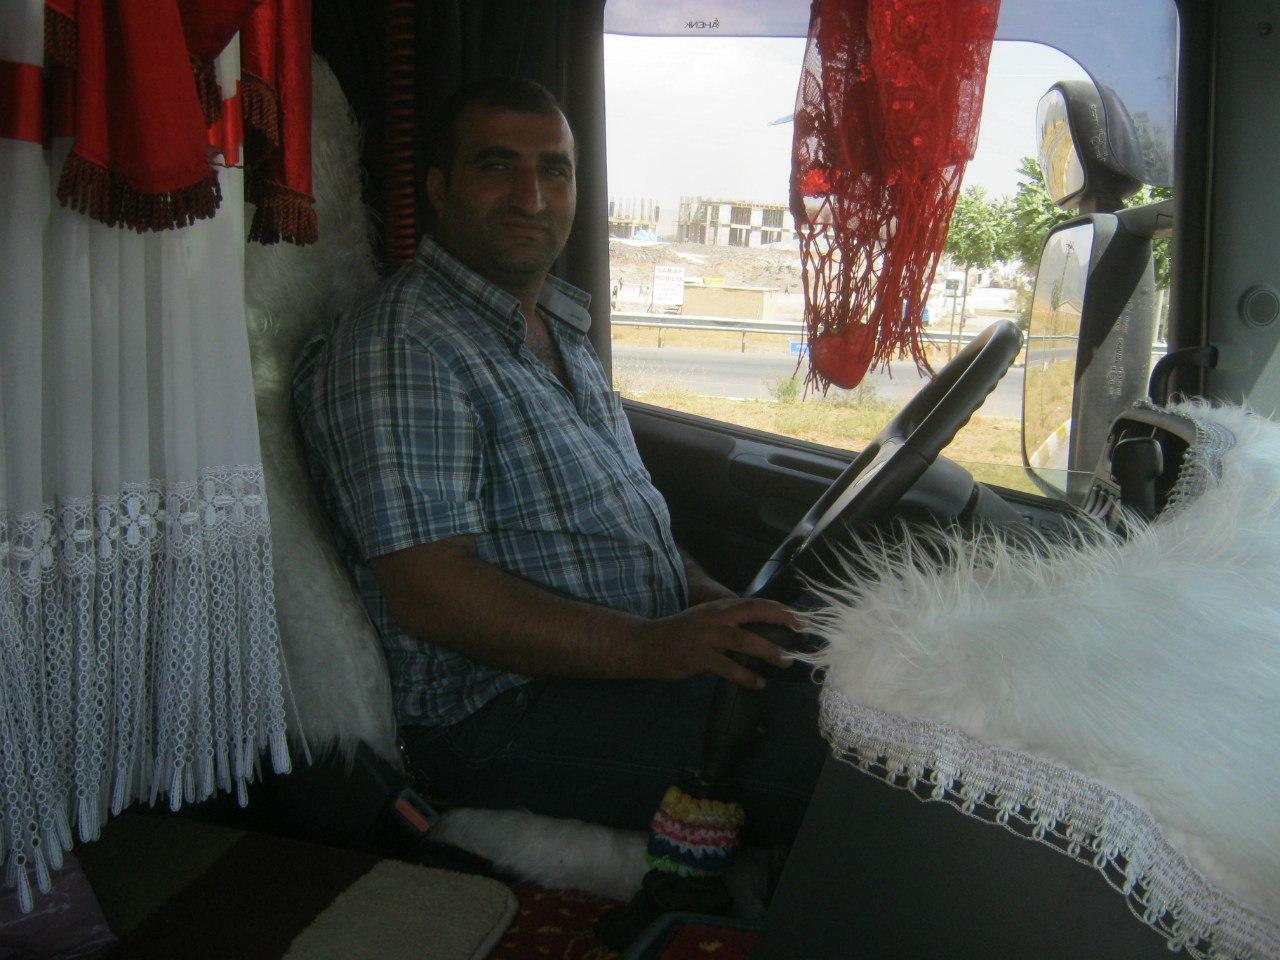 ковры на полу кабины турецкого грузовика